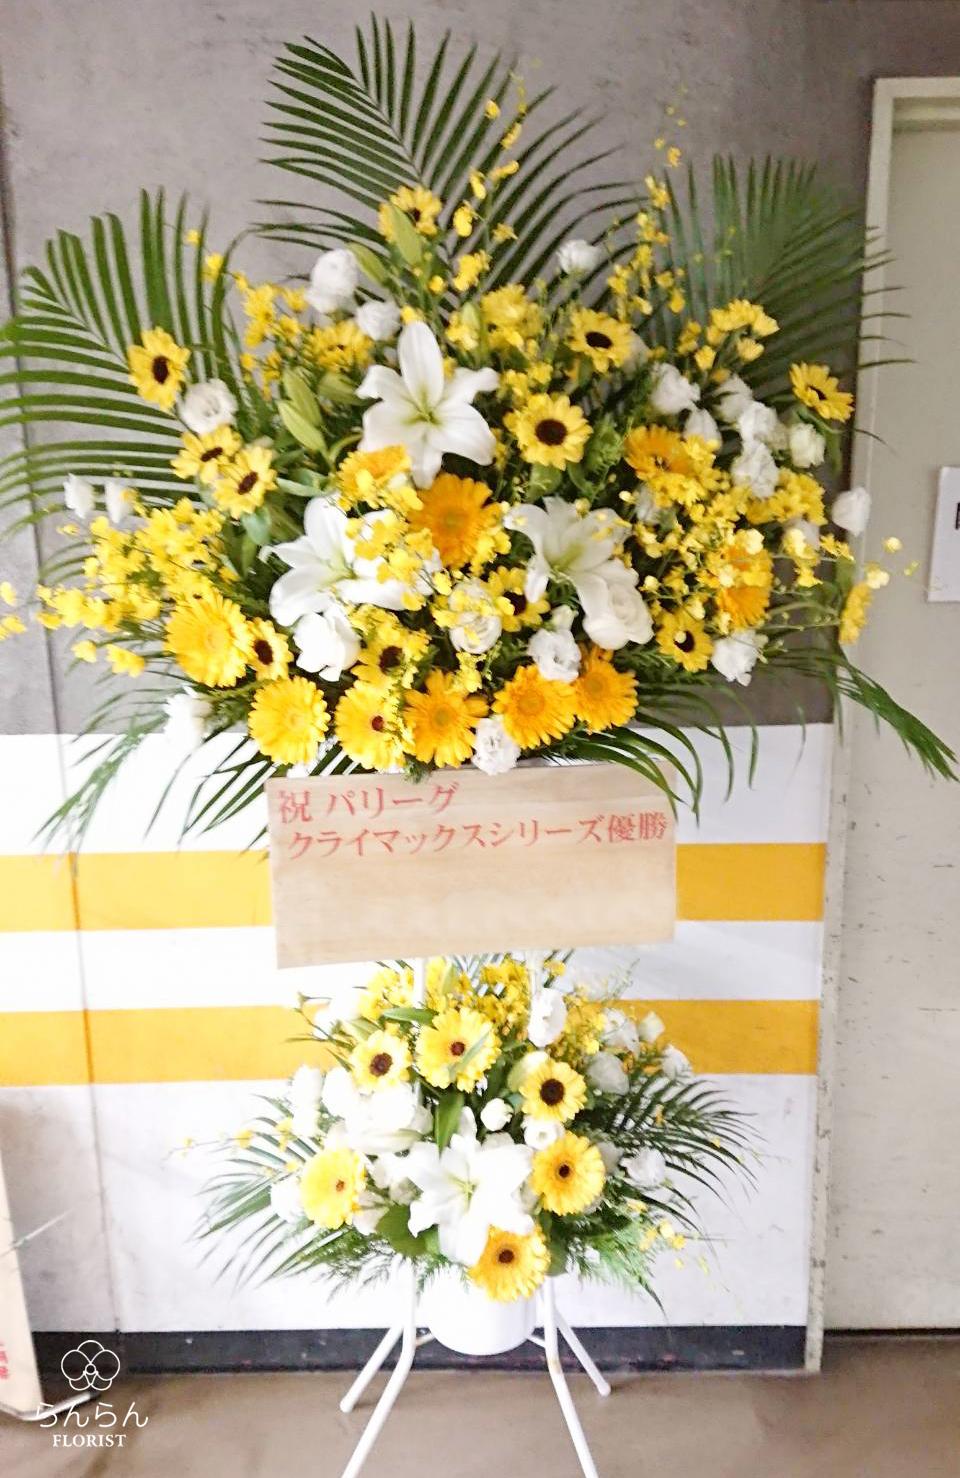 SCRAMBLE STUDIO 福岡 お祝いスタンド花